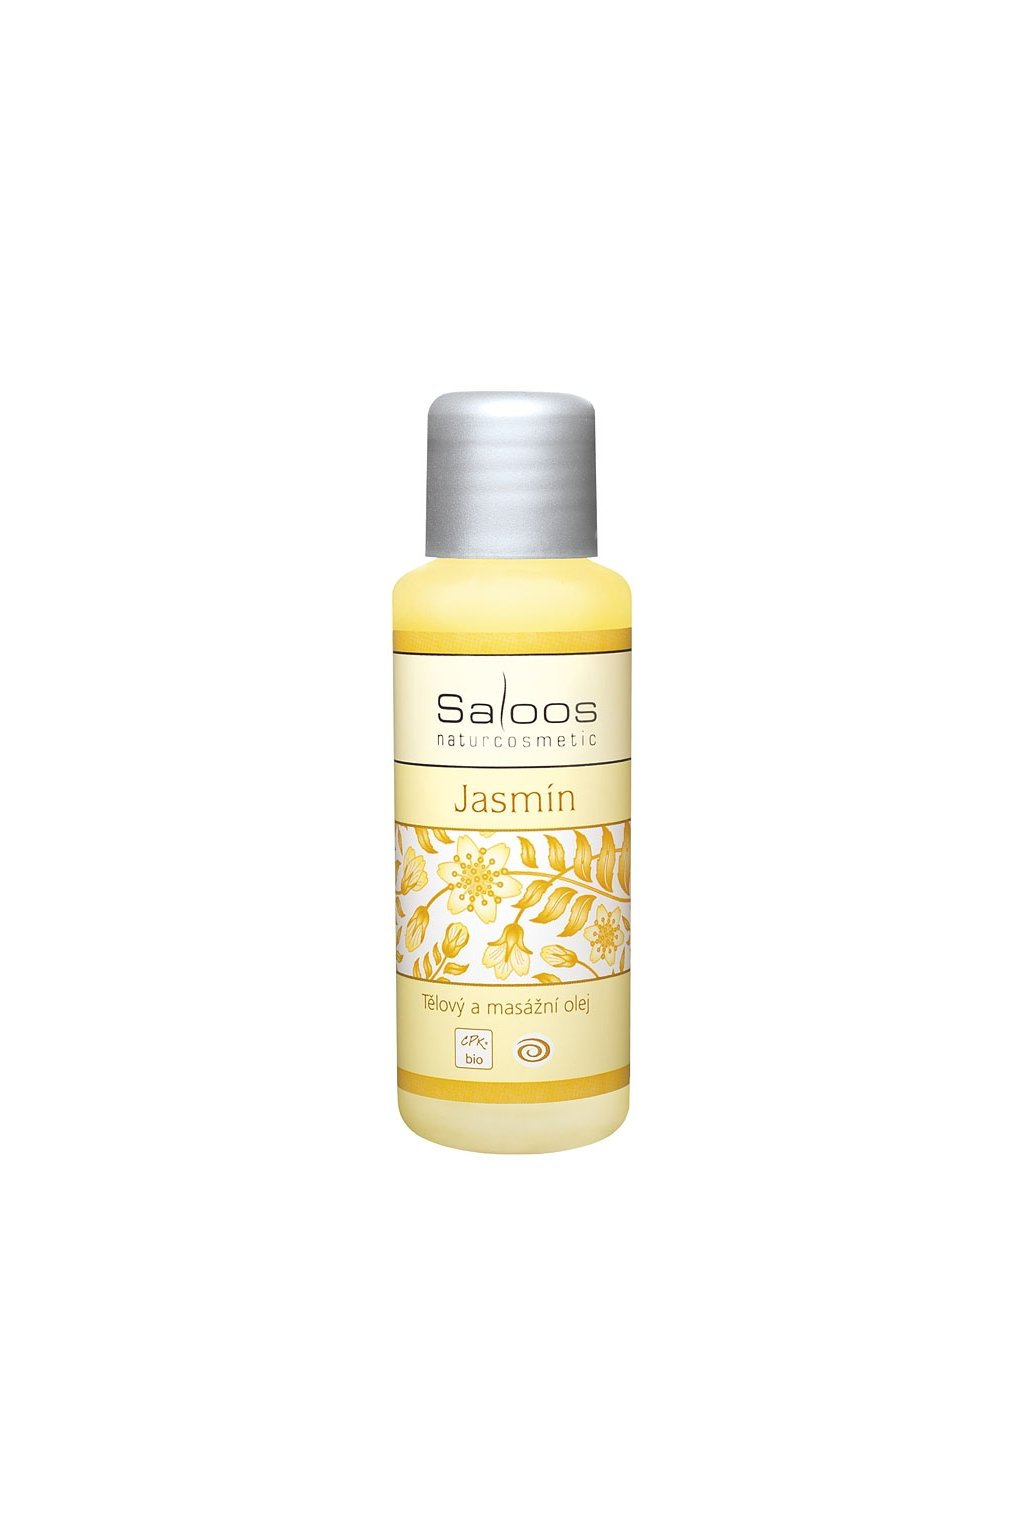 Saloos tělový a masážní olej Jasmín (varianta 1000ml)